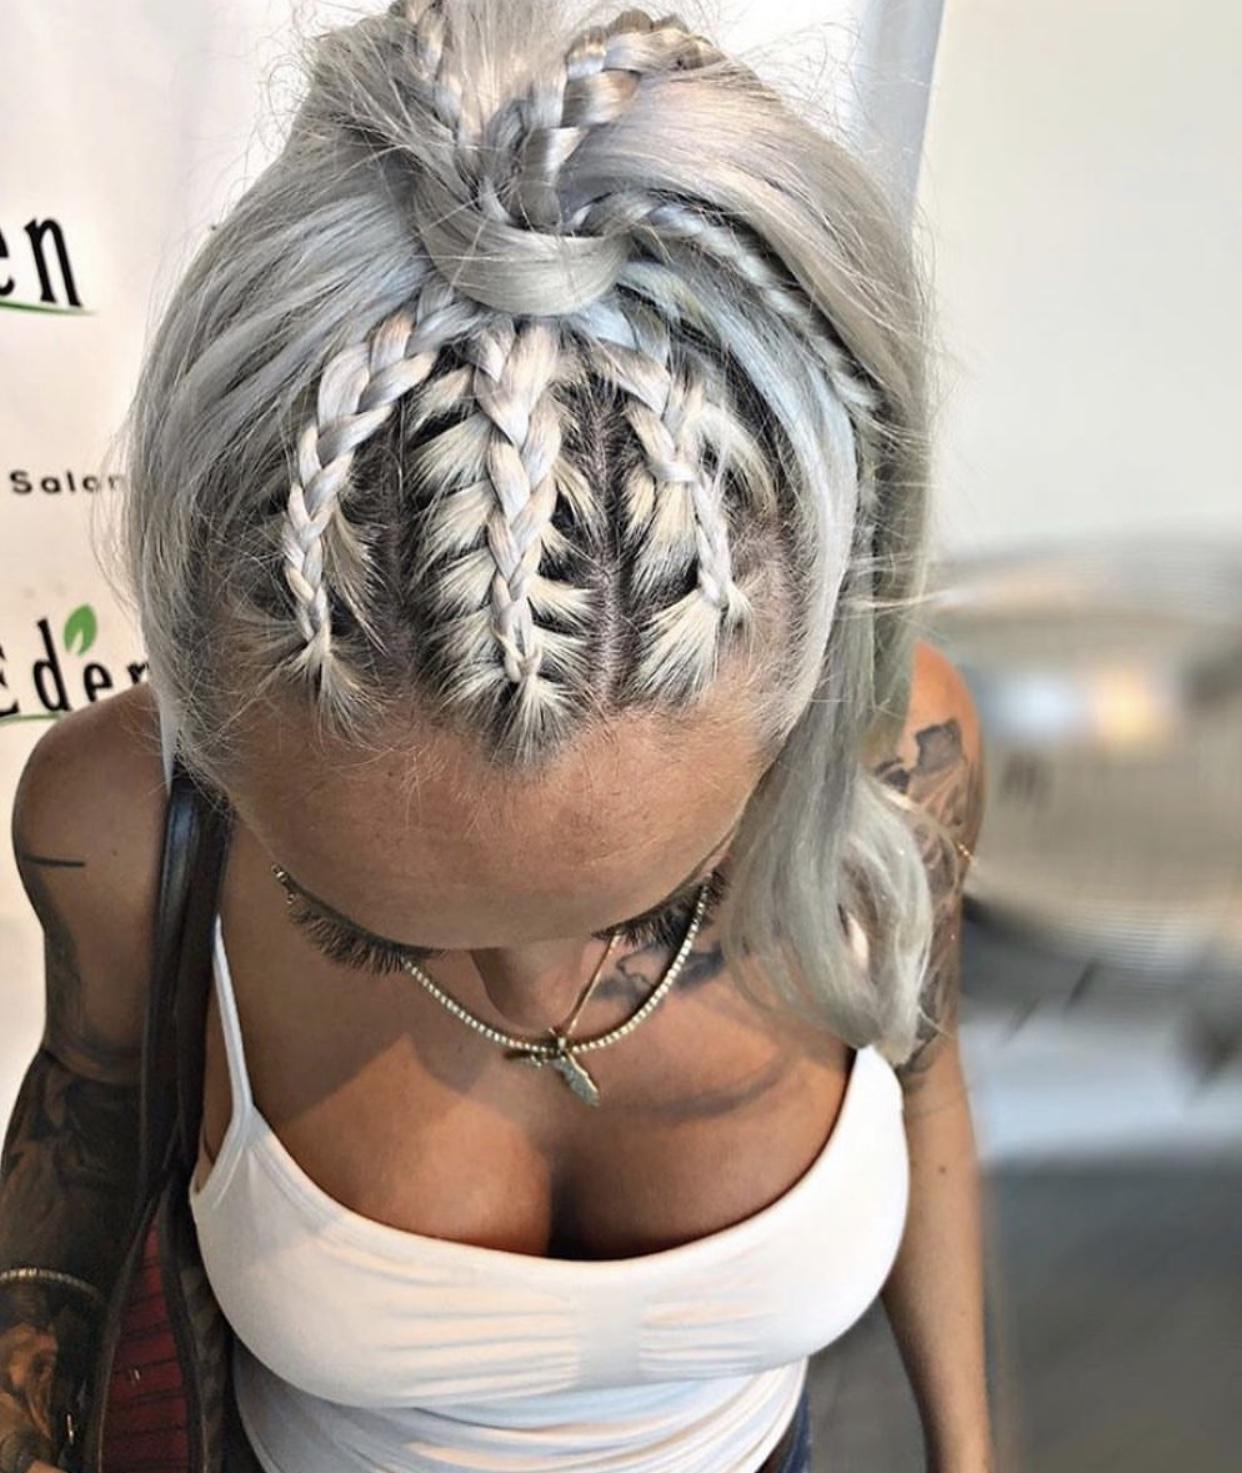 eden_vero_beach_hair_salon_02.jpg